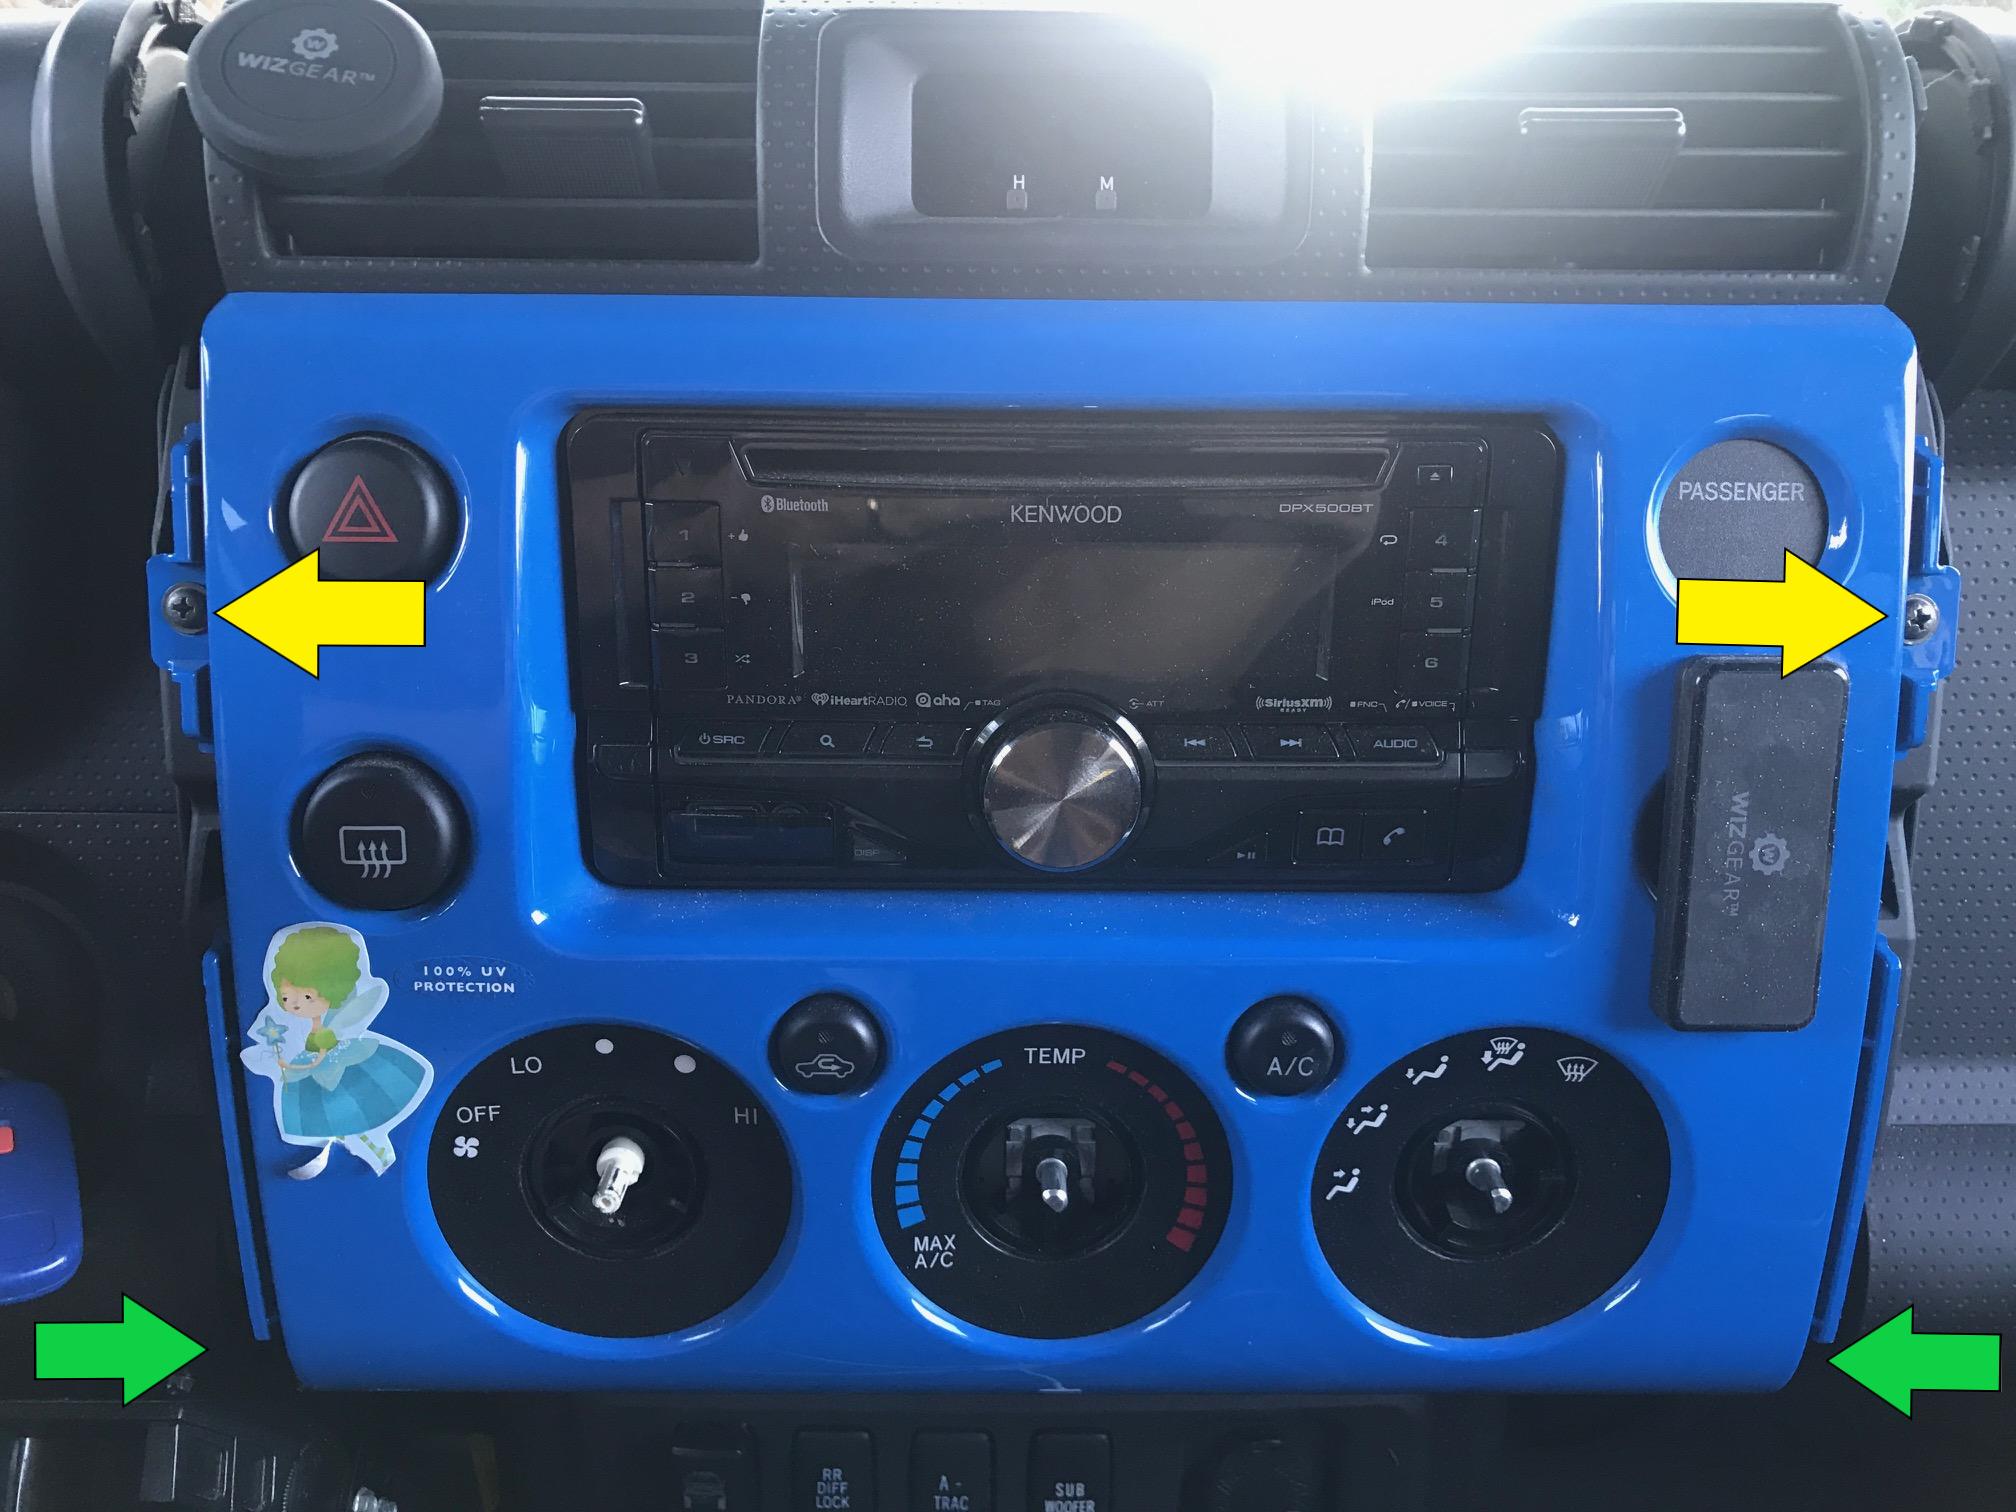 39 07 fj w subwoofer want new hu with waze carplay rear cam and speakerphone toyota fj. Black Bedroom Furniture Sets. Home Design Ideas